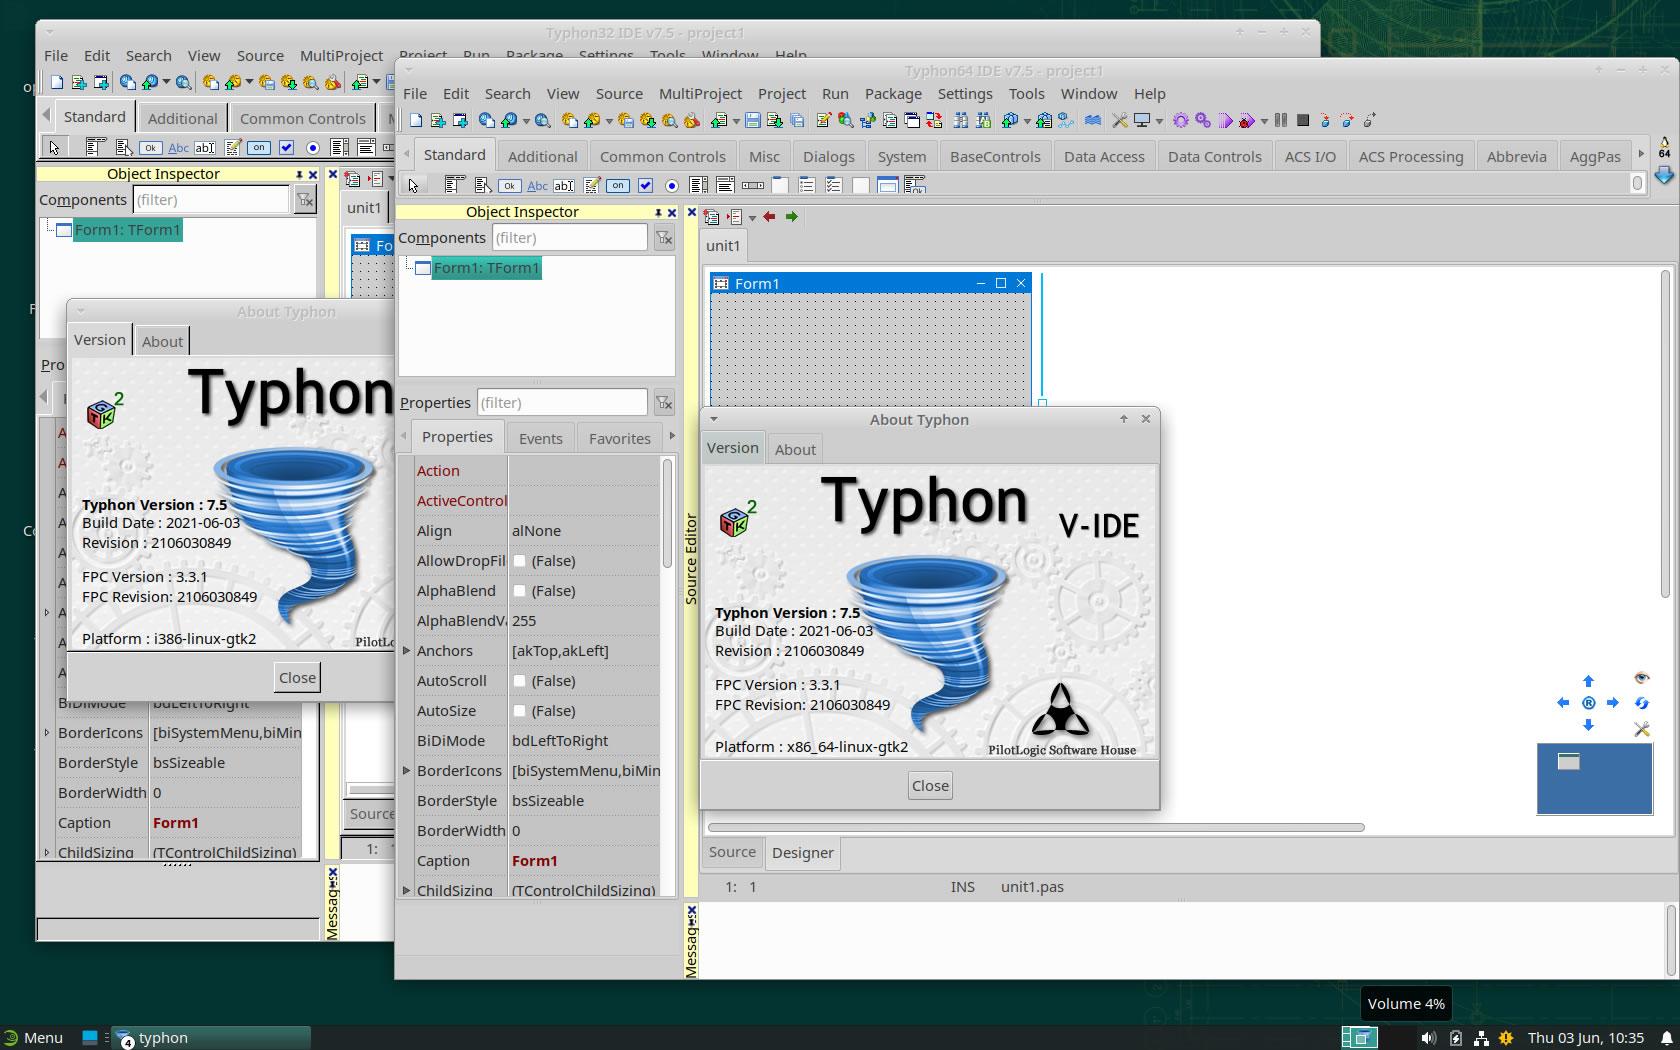 OpenSUSE153-2021-06-03-2.jpg